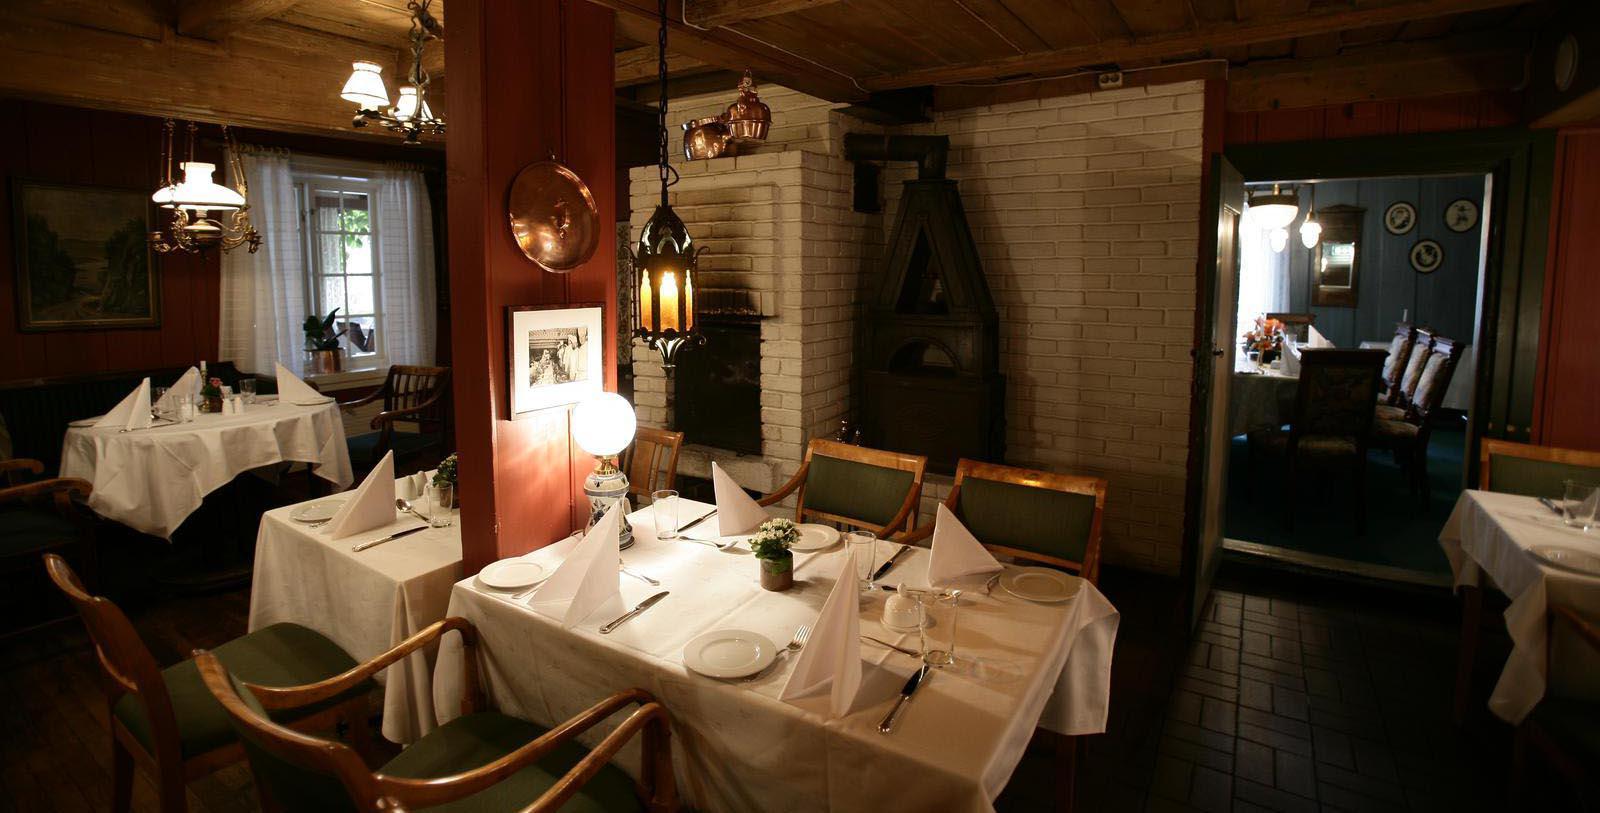 Image of Dining Room at Sundvolden Hotel, 1648, Member of Historic Hotels Worldwide, in Krokkleiva, Norway, Taste